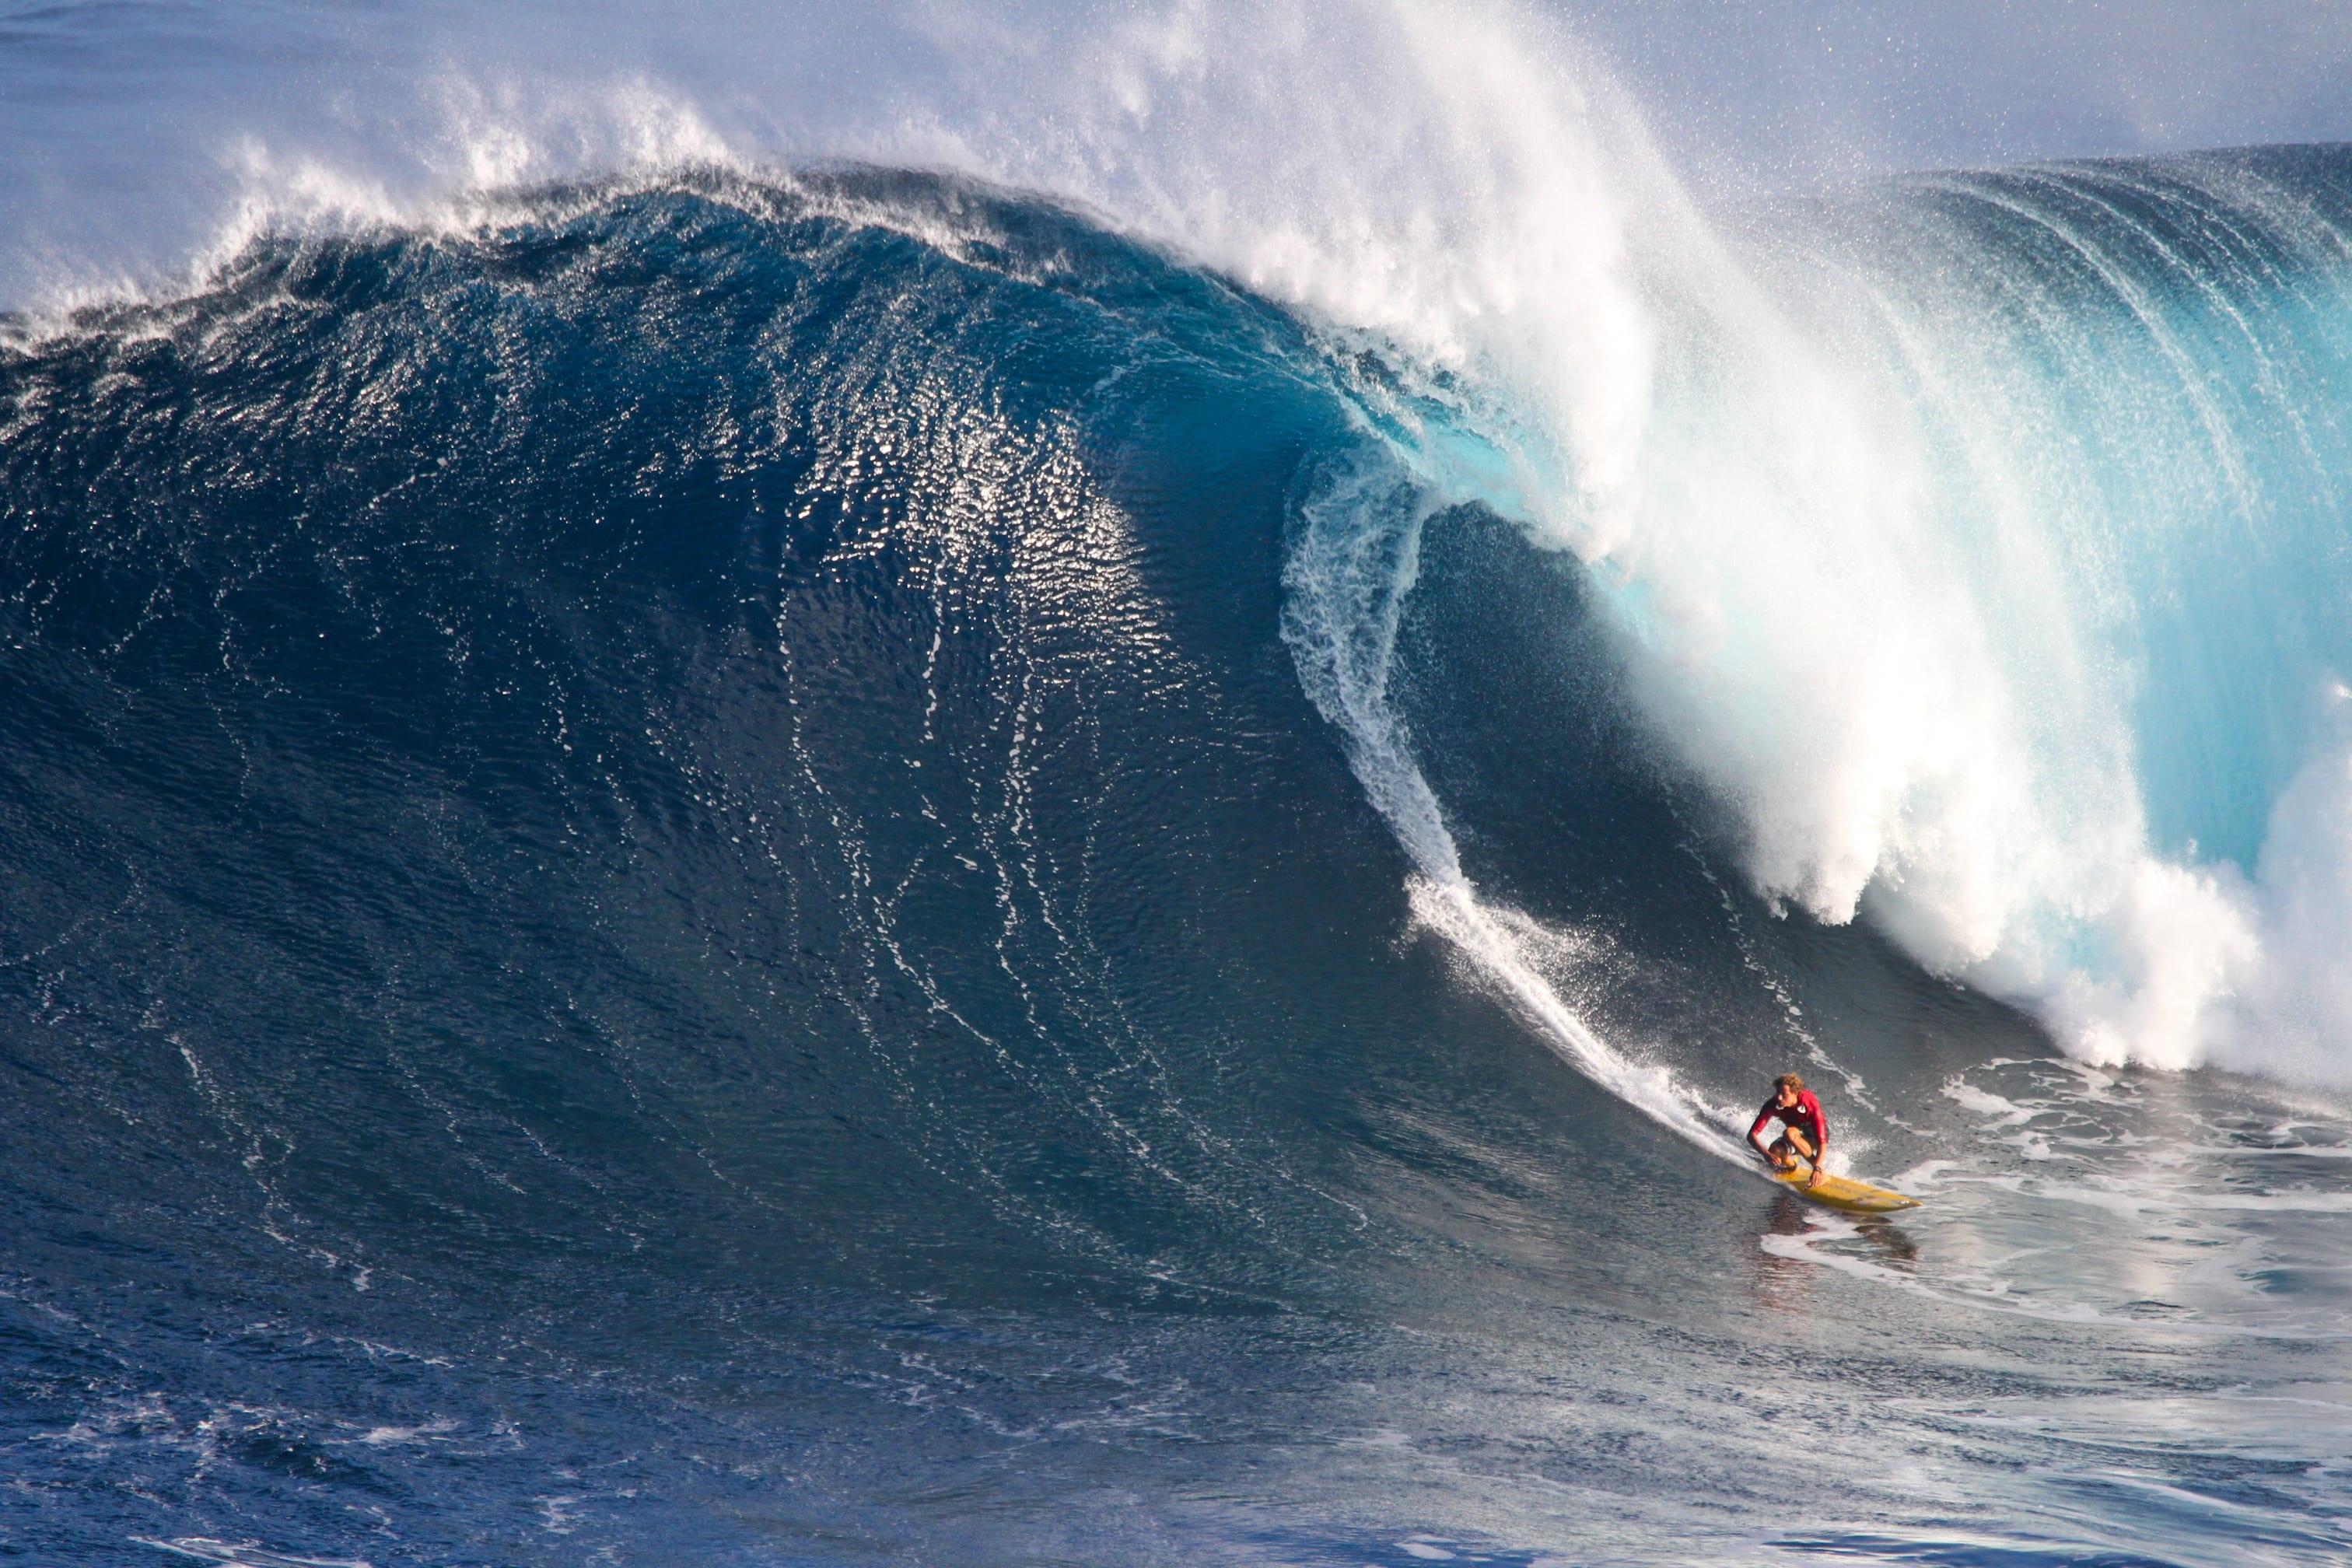 Ridge Lenny surfing in Hawaii